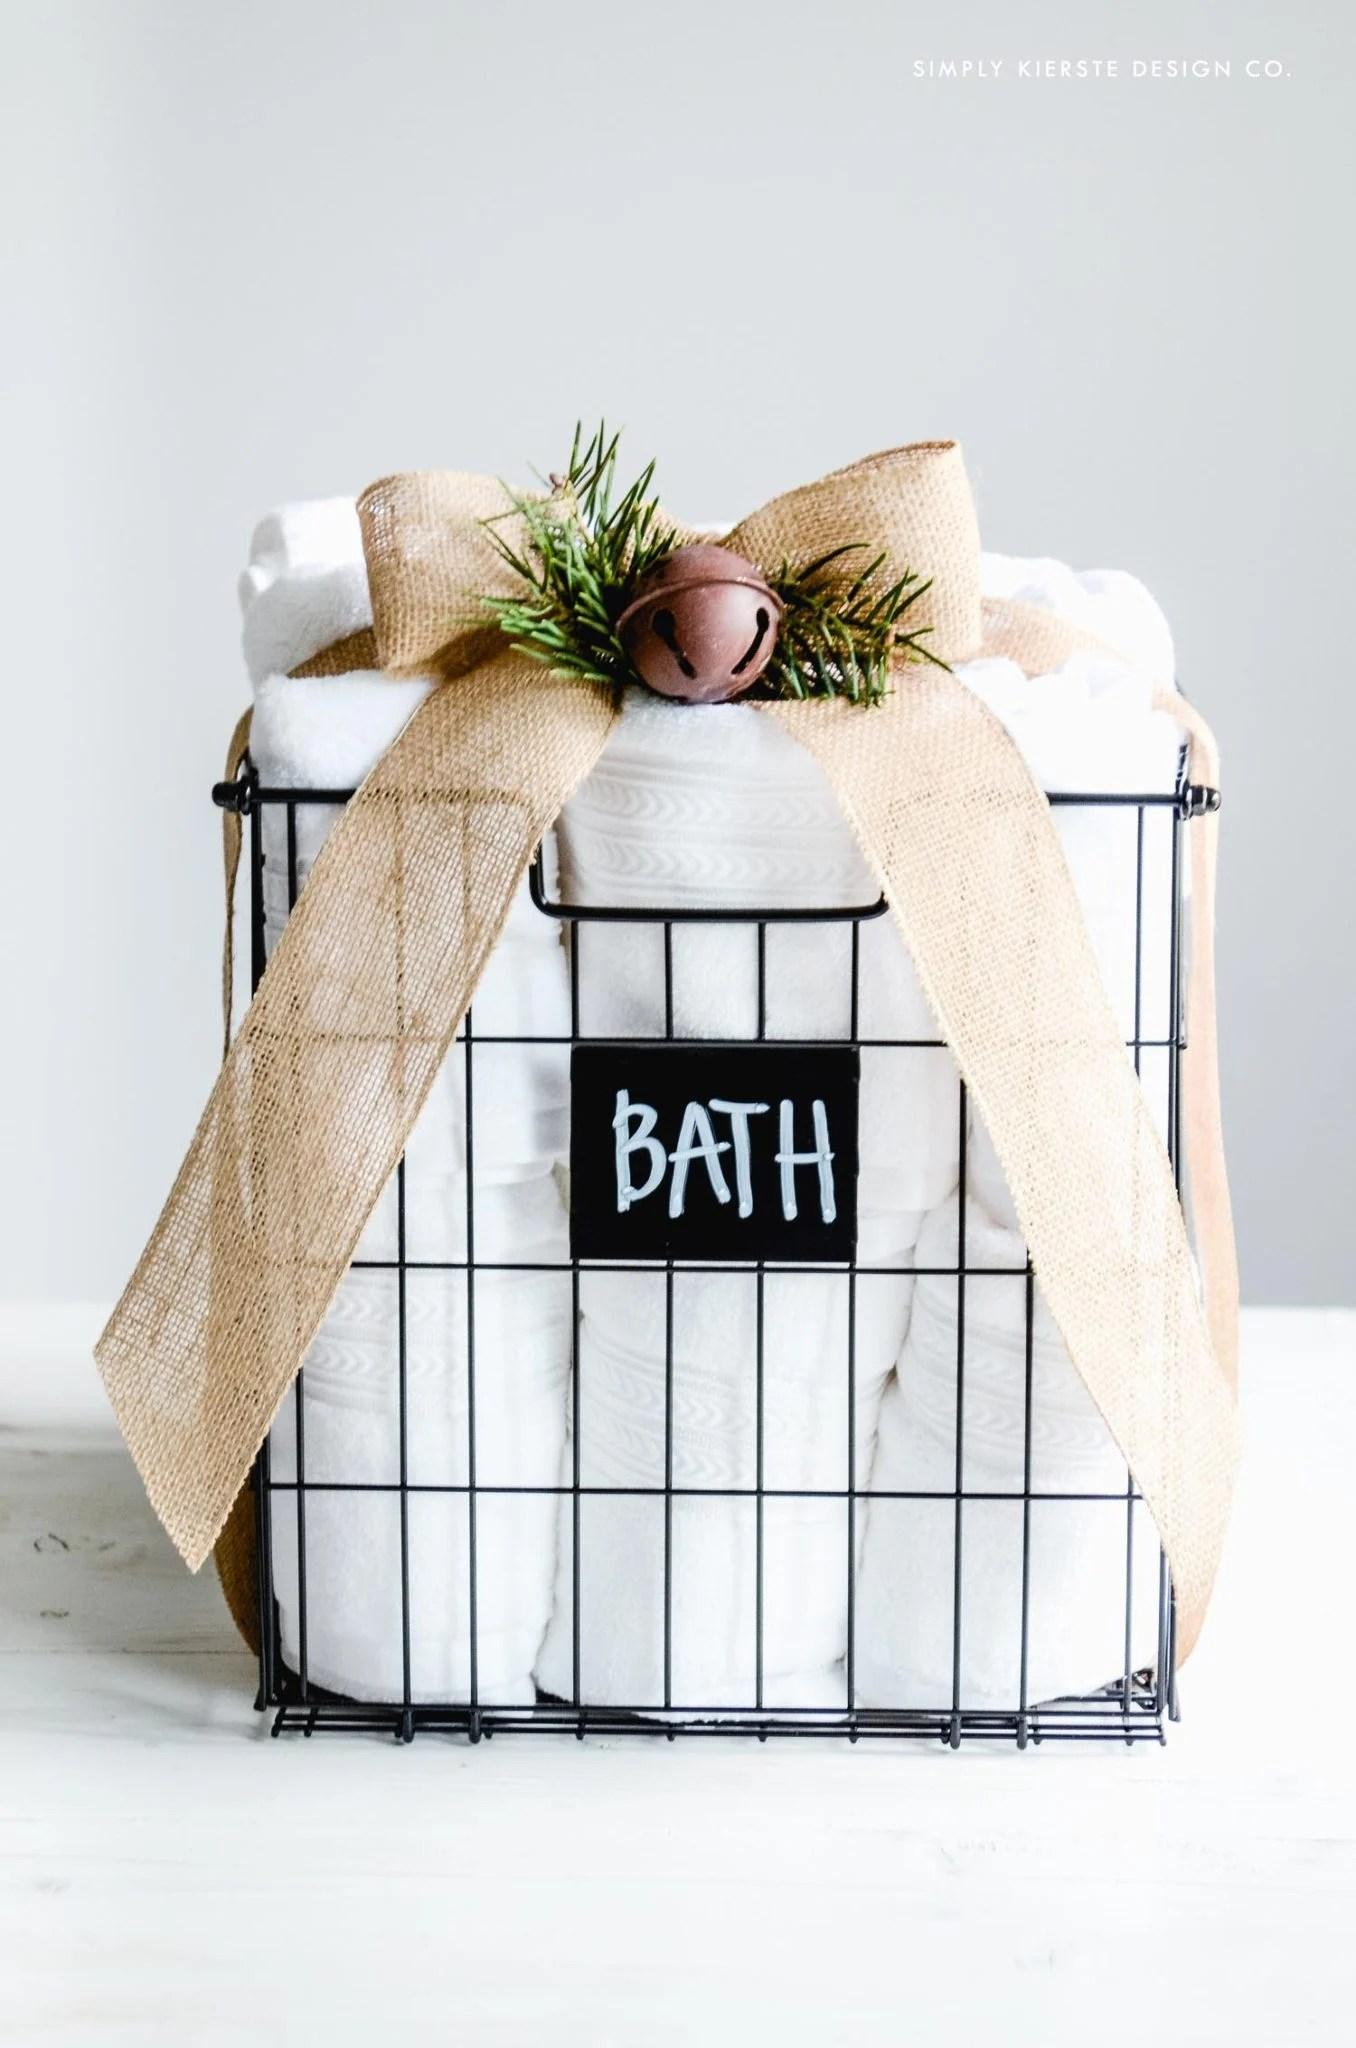 Affordable Gift Ideas | oldsaltfarm.com #farmhousestyle #giftideasonabudget #easygiftideas